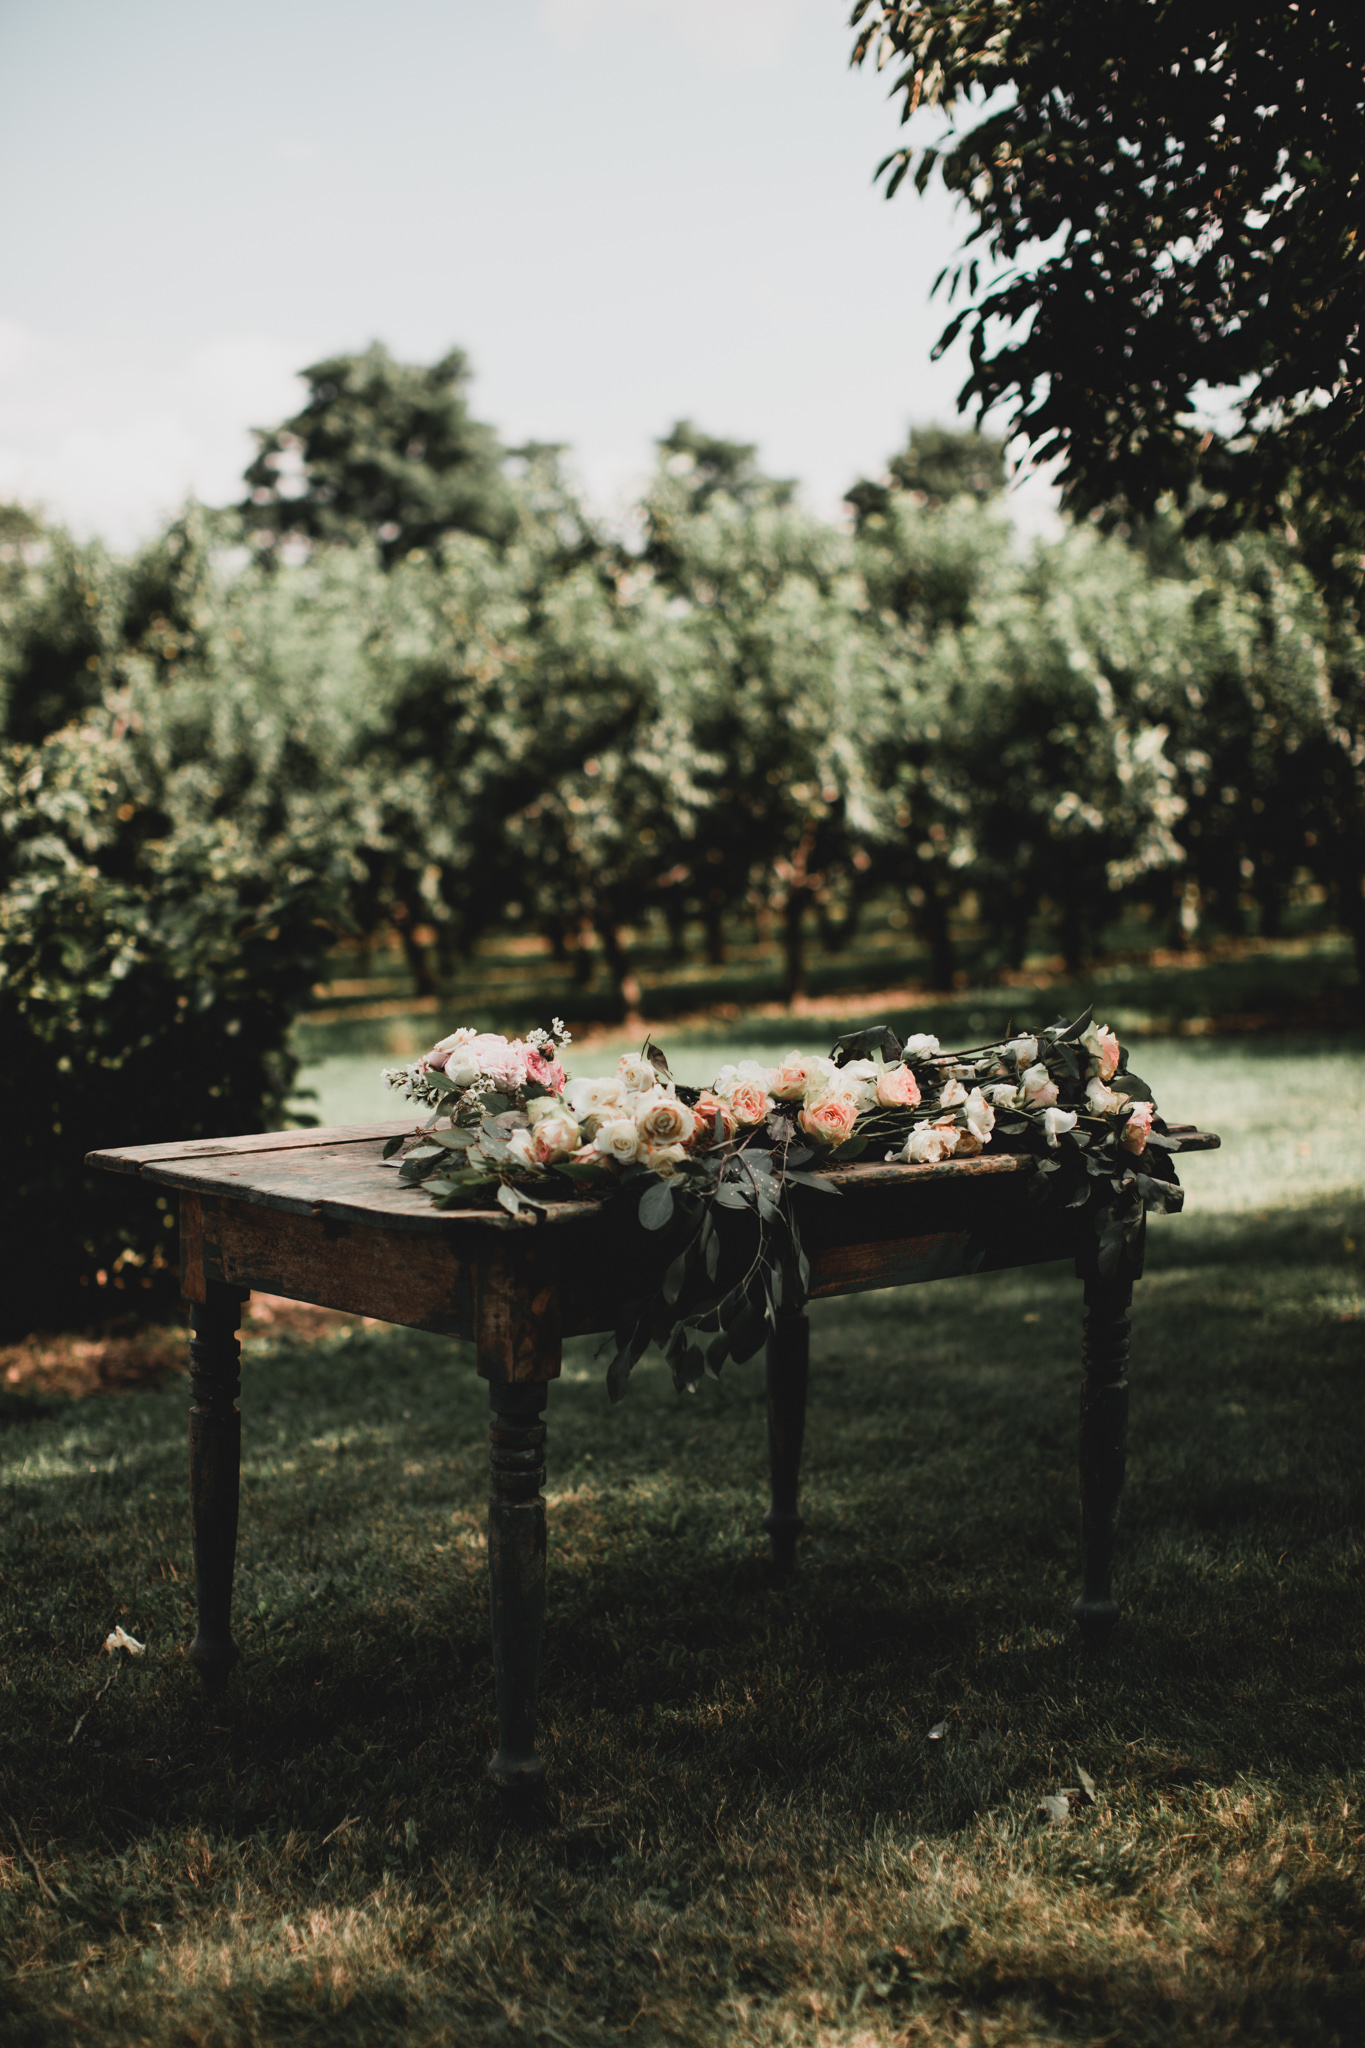 082-WEB-Jonathan-Kuhn-Photography-Ross-Jeff-Wedding-3890.jpg